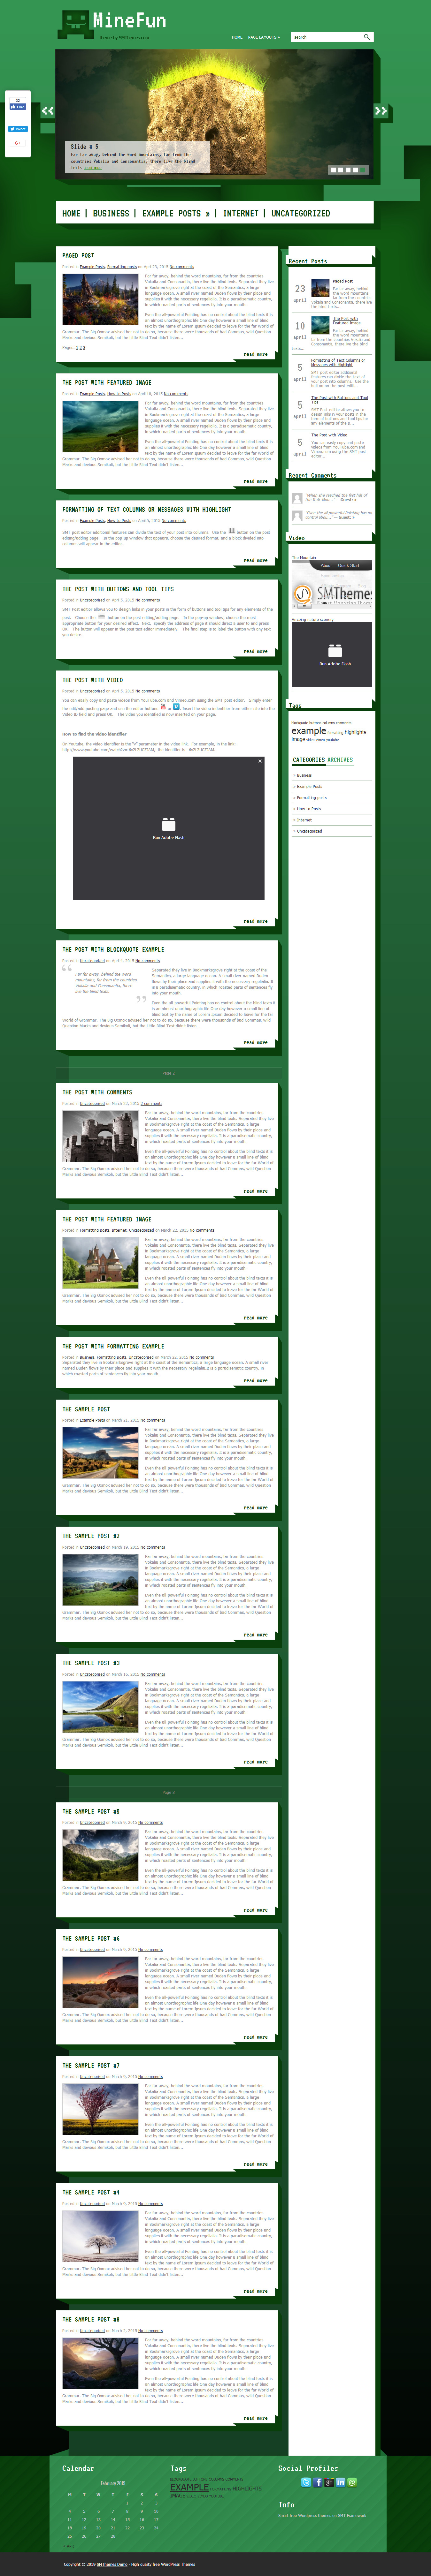 minefun best free gaming wordpress theme - 10+ Best Free Gaming WordPress Themes